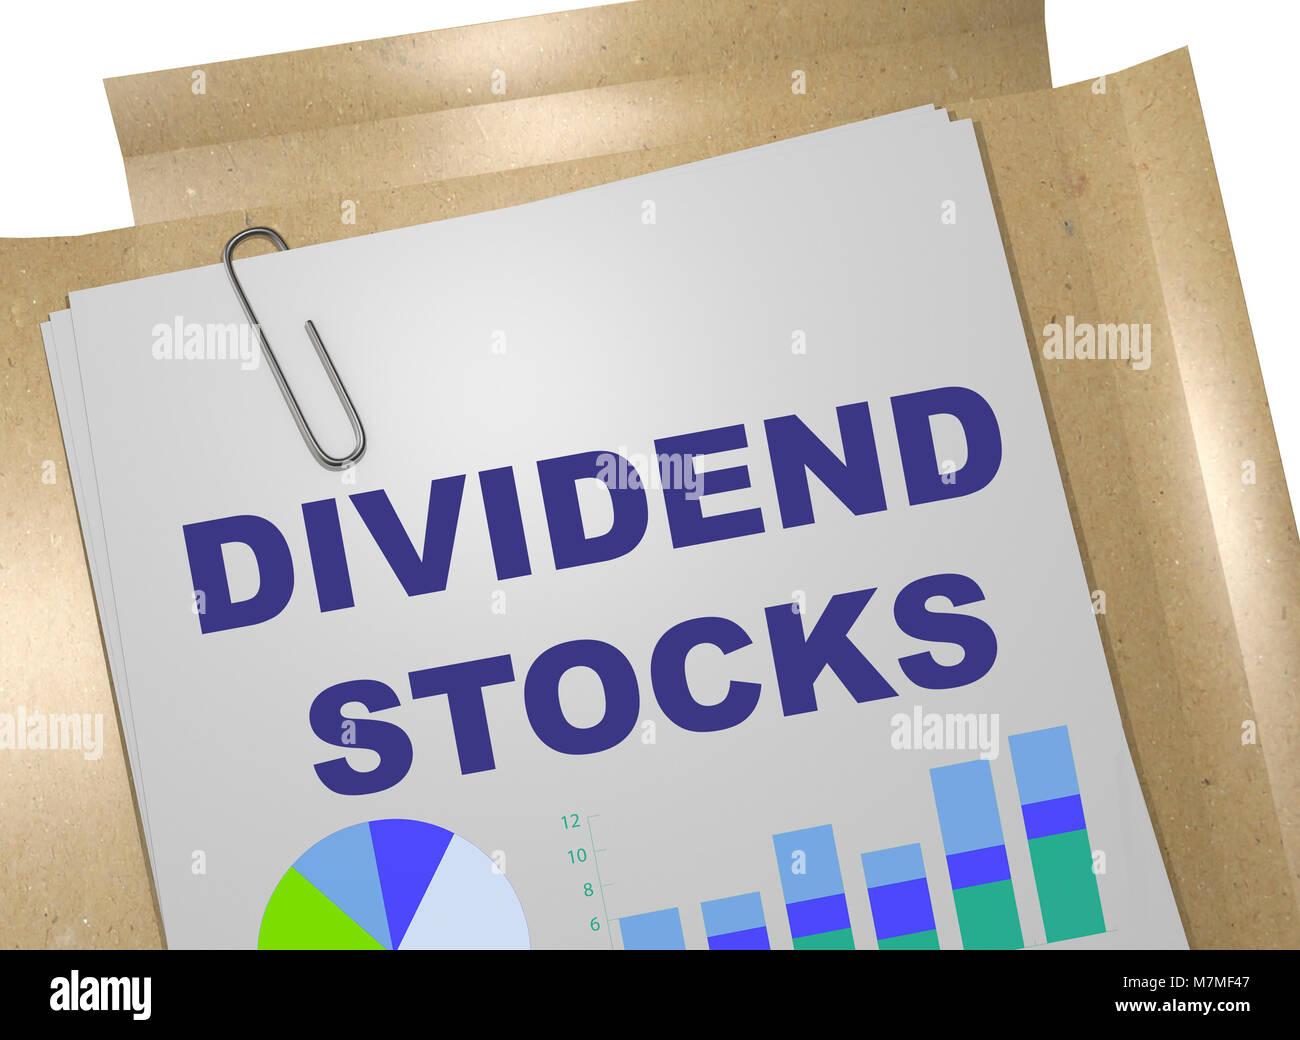 3D illustration of DIVIDEND STOCKS on business document - Stock Image